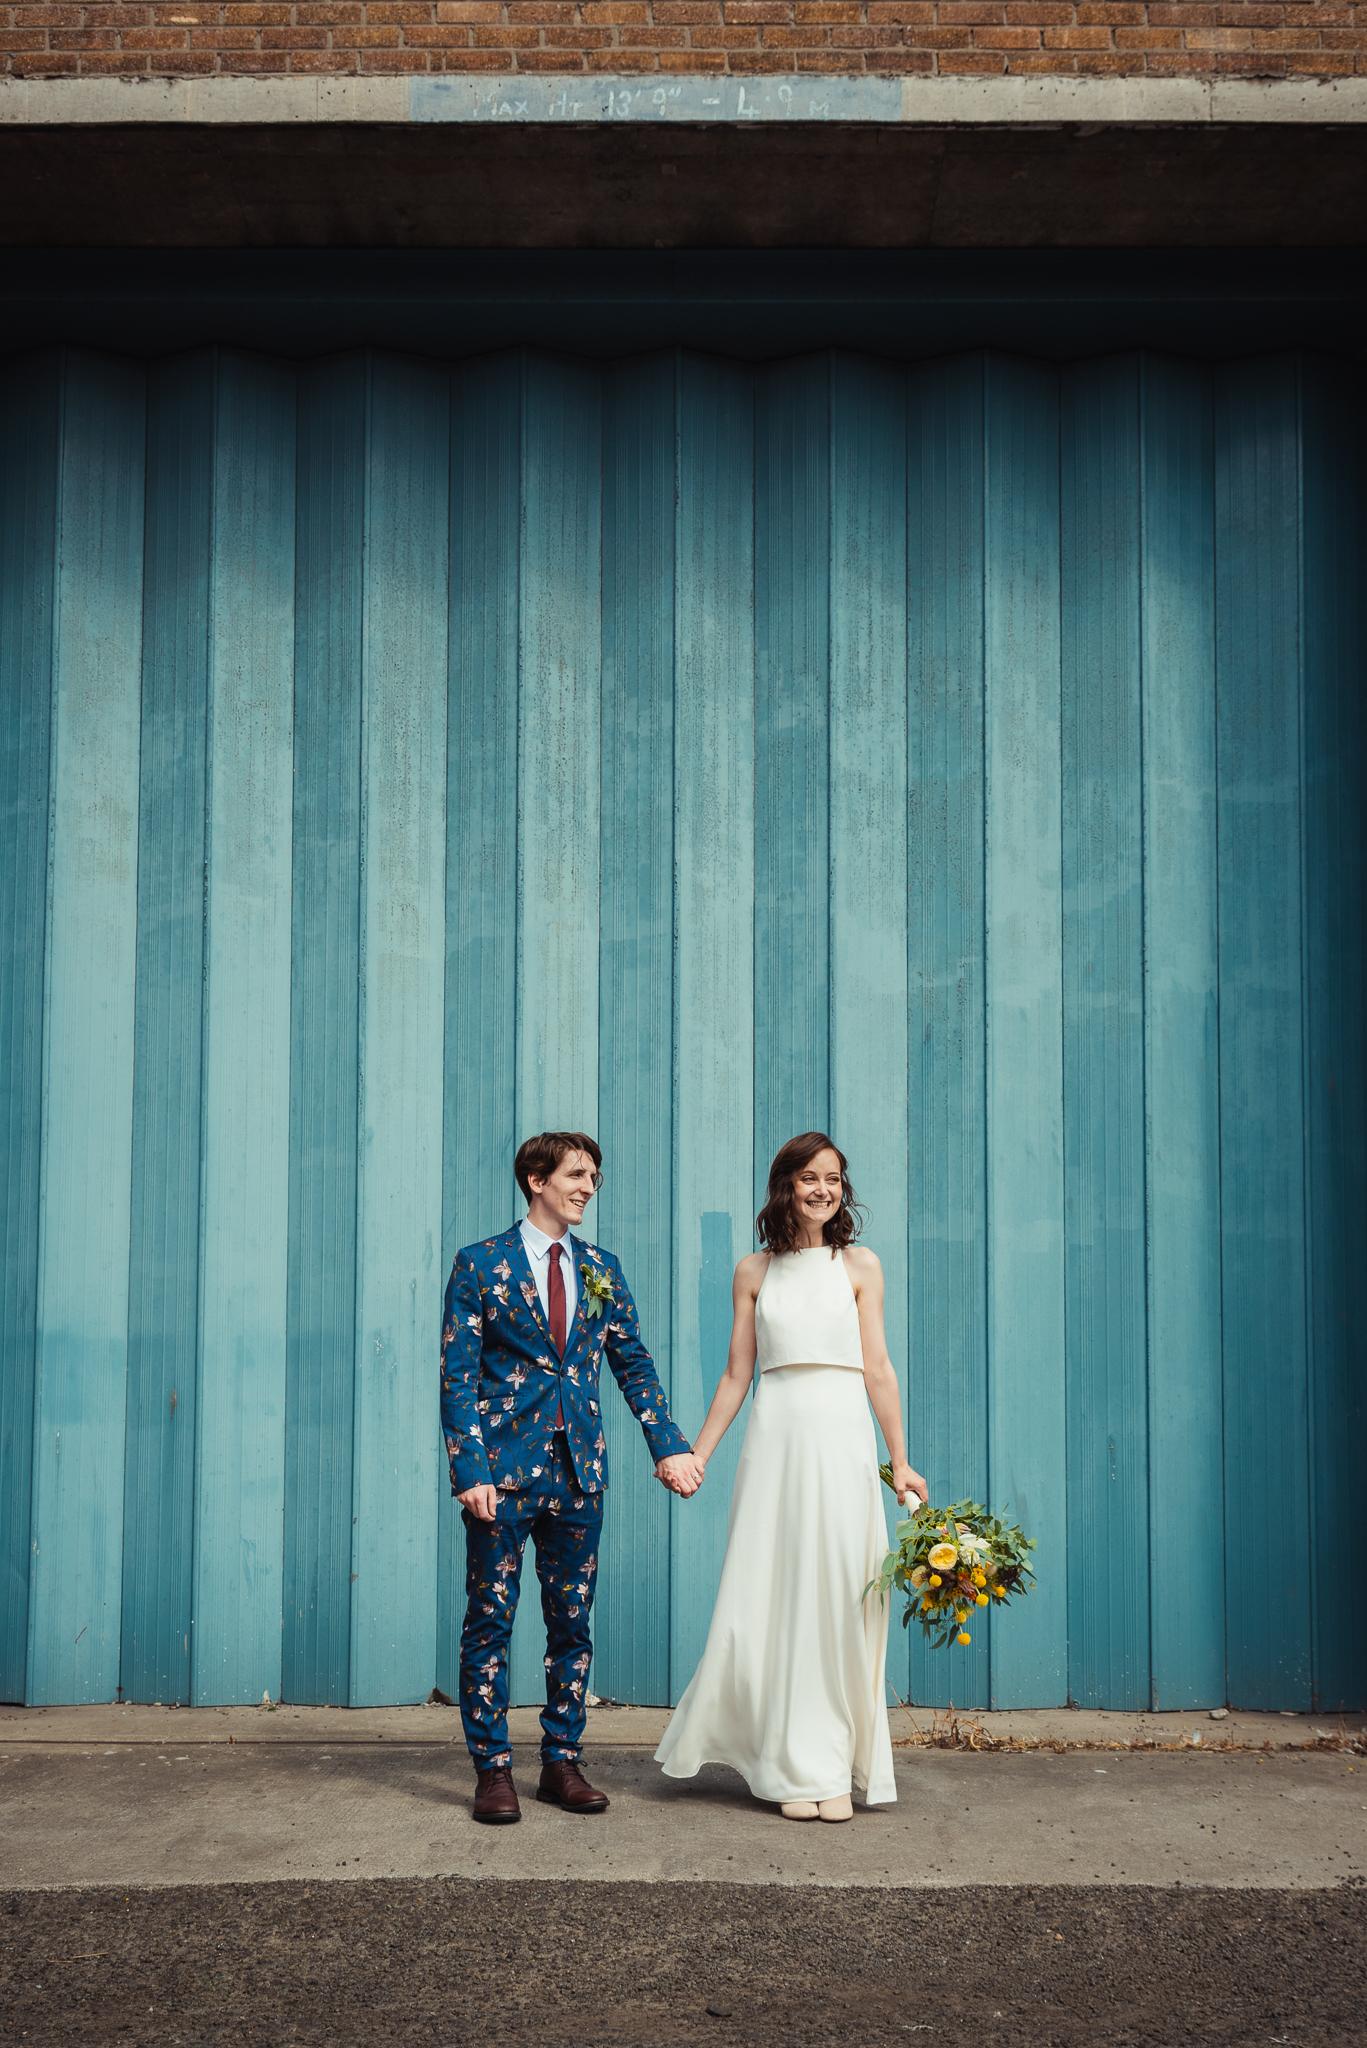 Lynch Rogers Wedding - GC_web res-5938.jpg